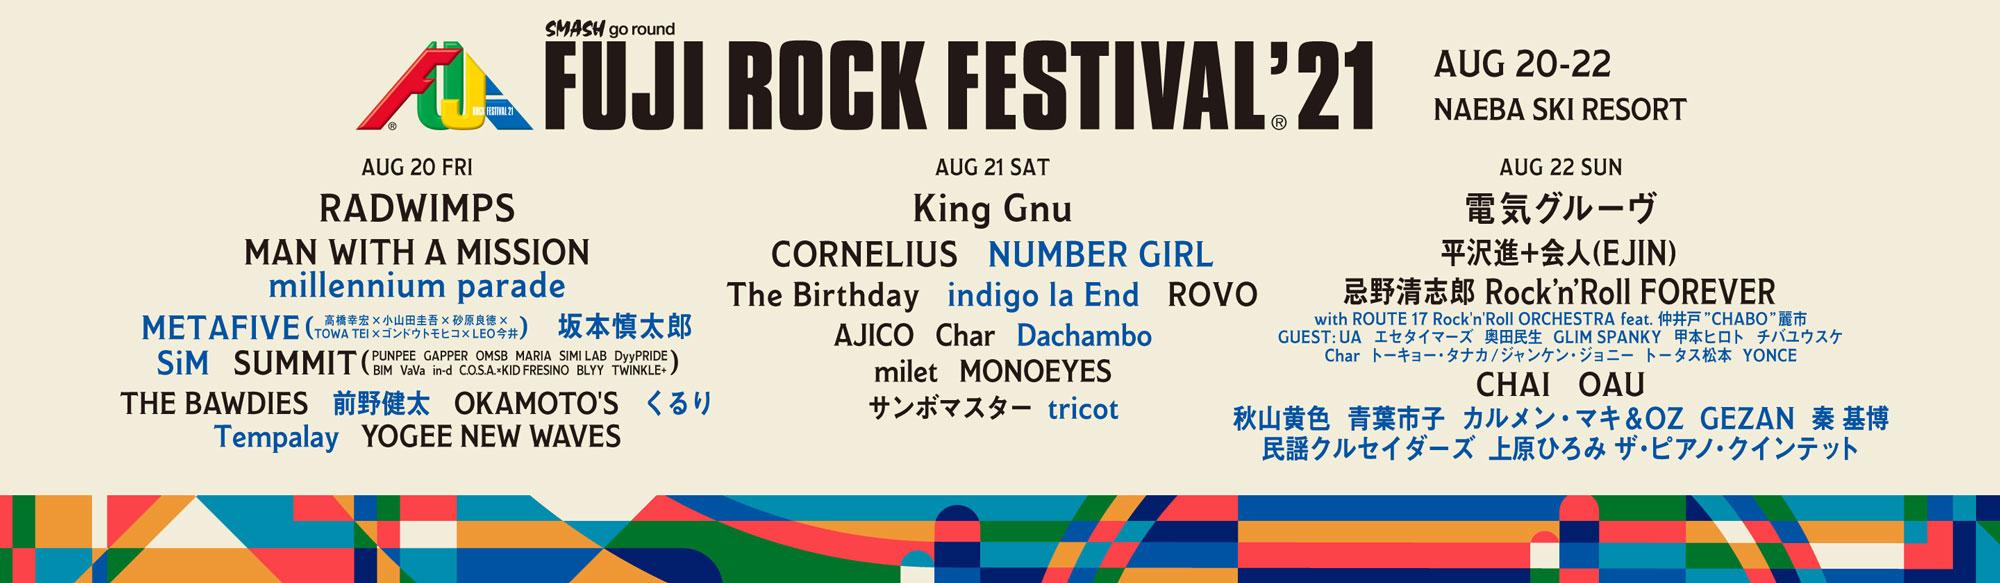 FUJI ROCK FESTIBAL'21